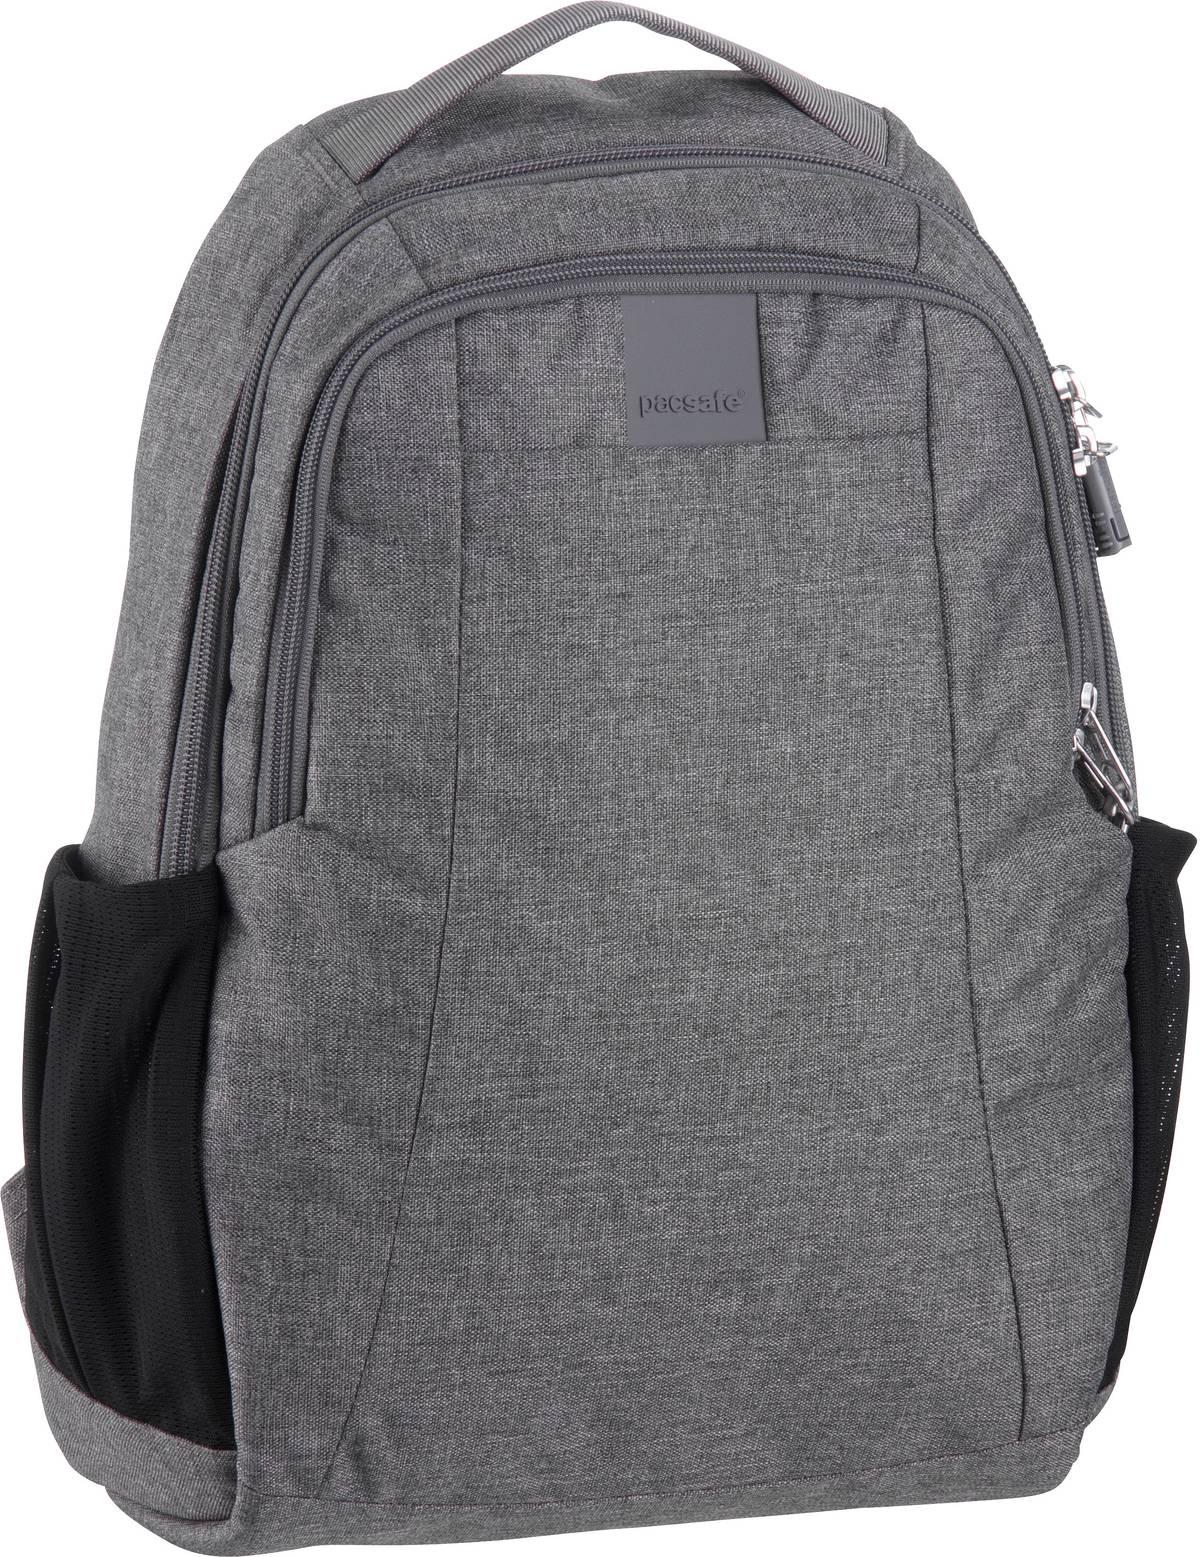 Laptoprucksack Metrosafe LS350 Backpack Dark Tweed (15 Liter)